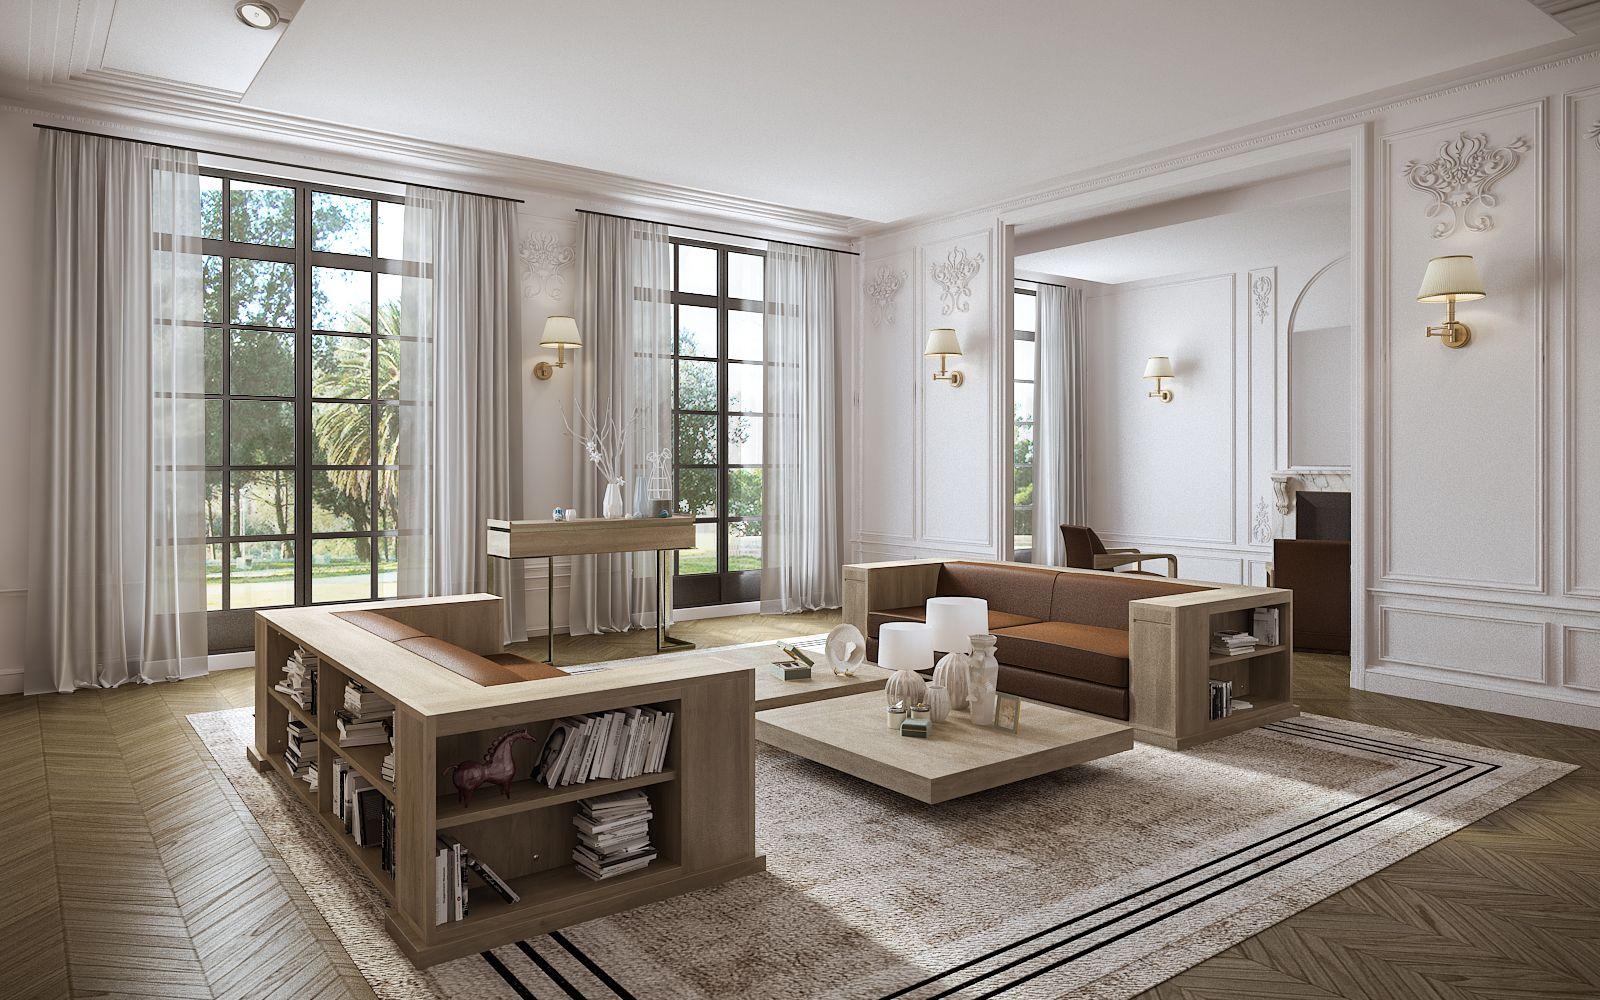 Sofa Living Room Garden Design French Artdeco Contemporary Luxury Salons Luxueux Hugues Chevalier Et Salon Contemporain